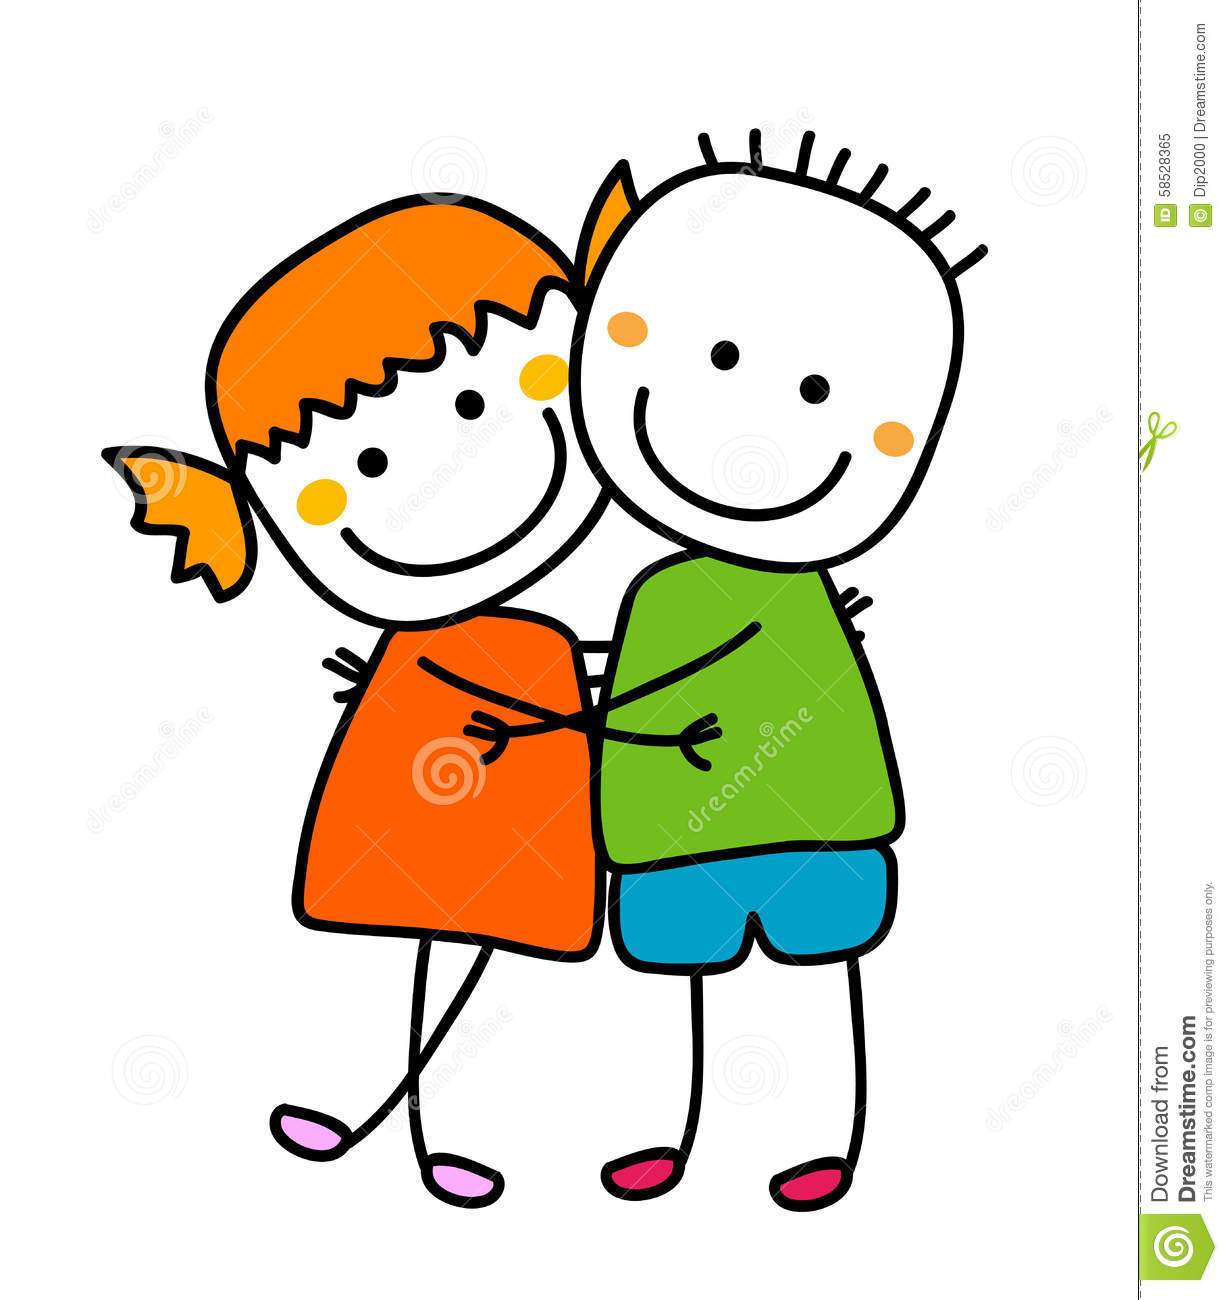 Clipart huging jpg transparent Hugging clipart 5 » Clipart Portal jpg transparent